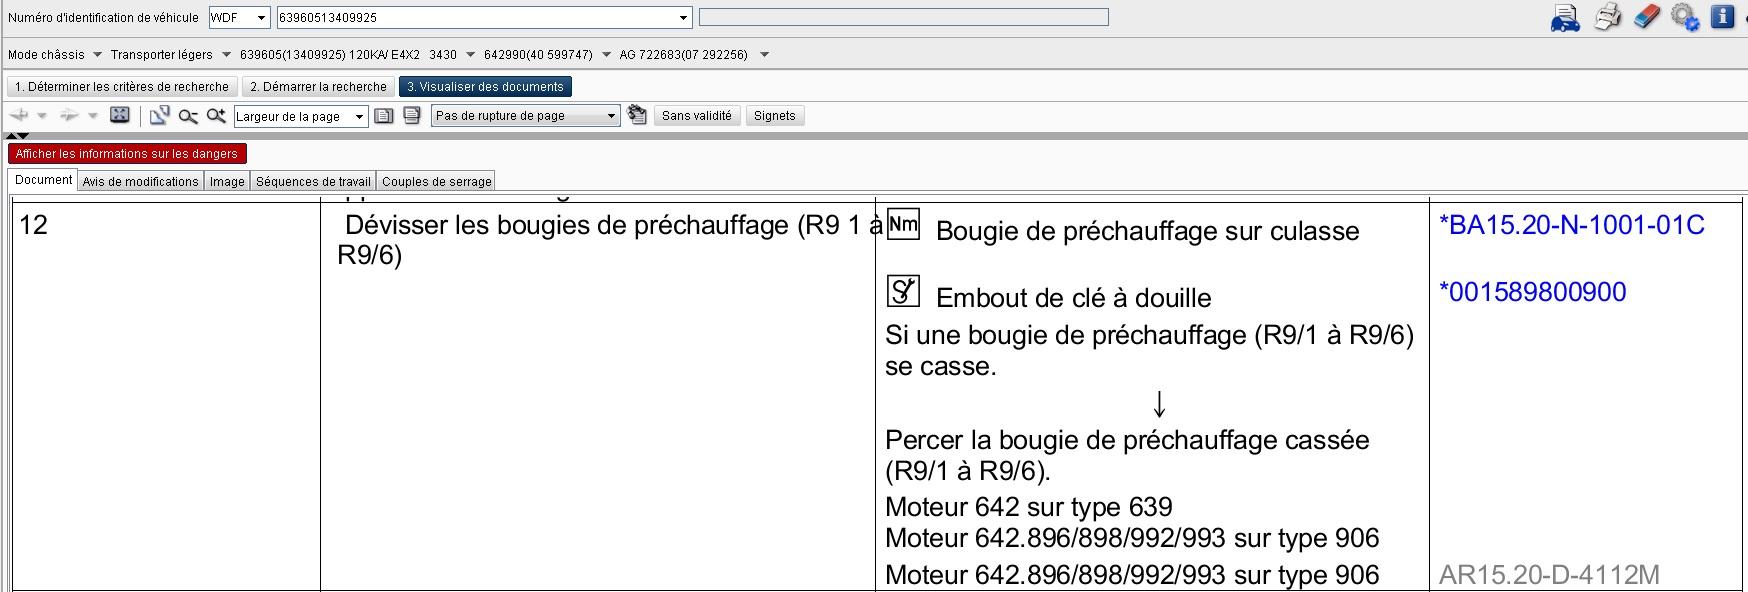 Bougie-prechauffage-2-Wdf63960513409925.jpg